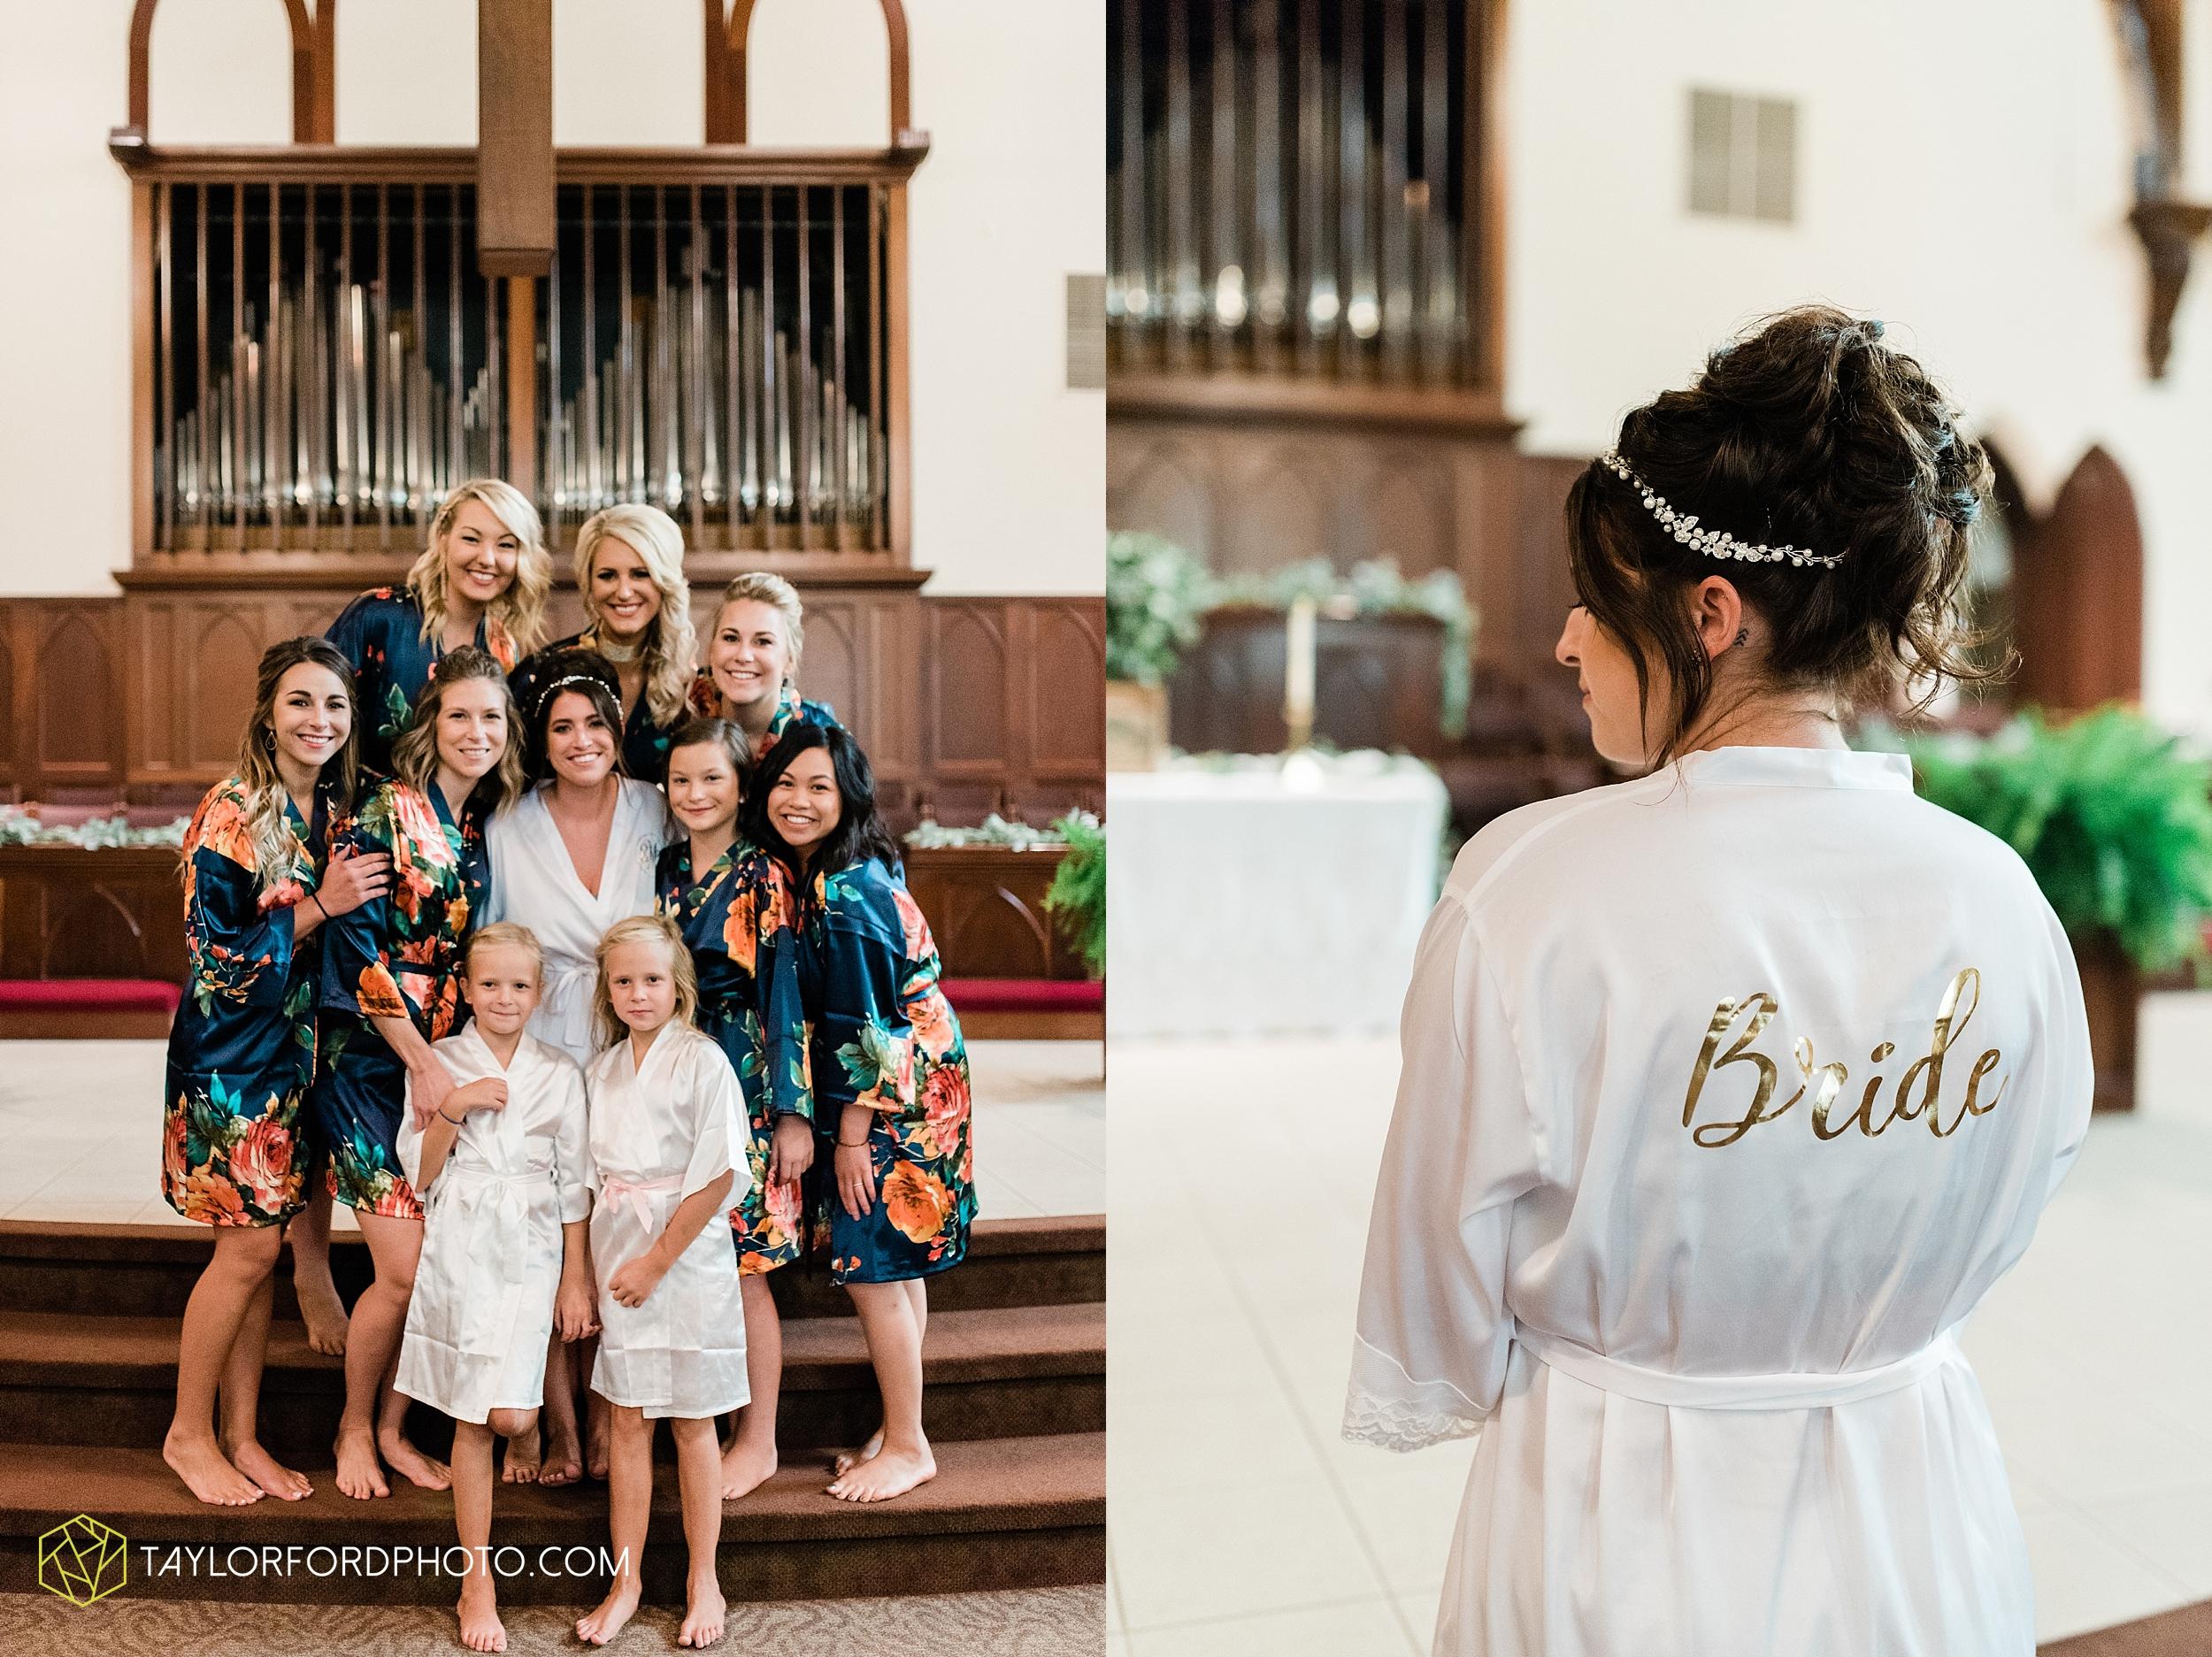 van-wert-ohio-first-united-methodist-church-county-dairy-barn-wedding-photographer-taylor-ford-photography_9806.jpg